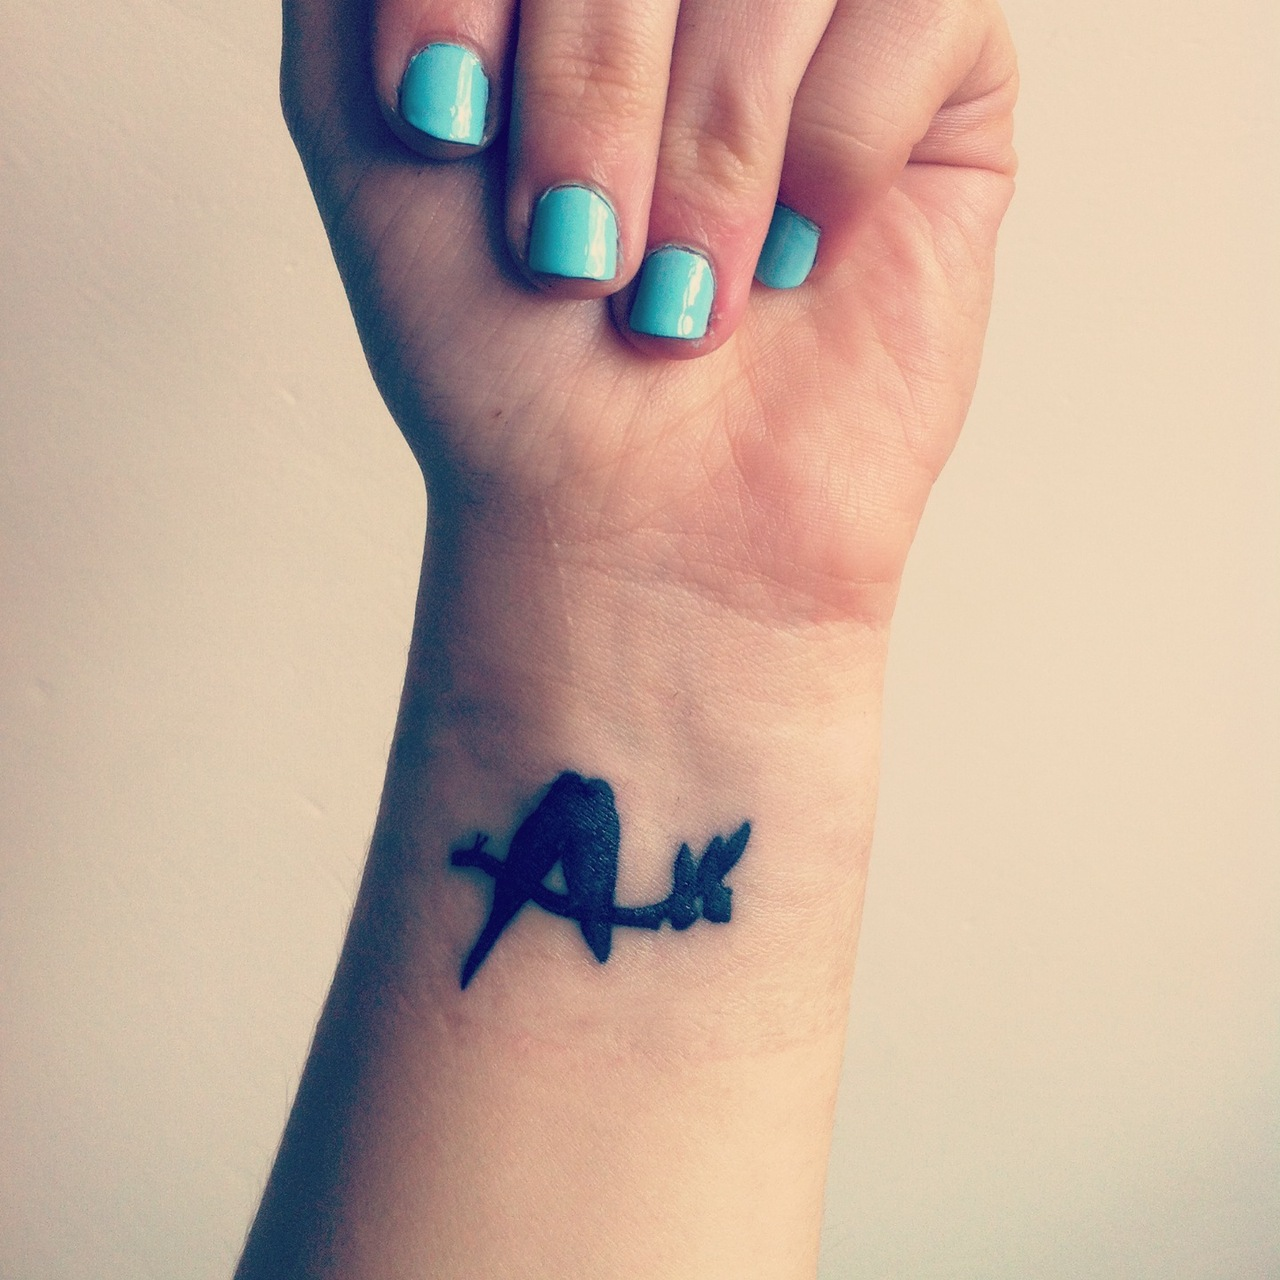 Cute little tat